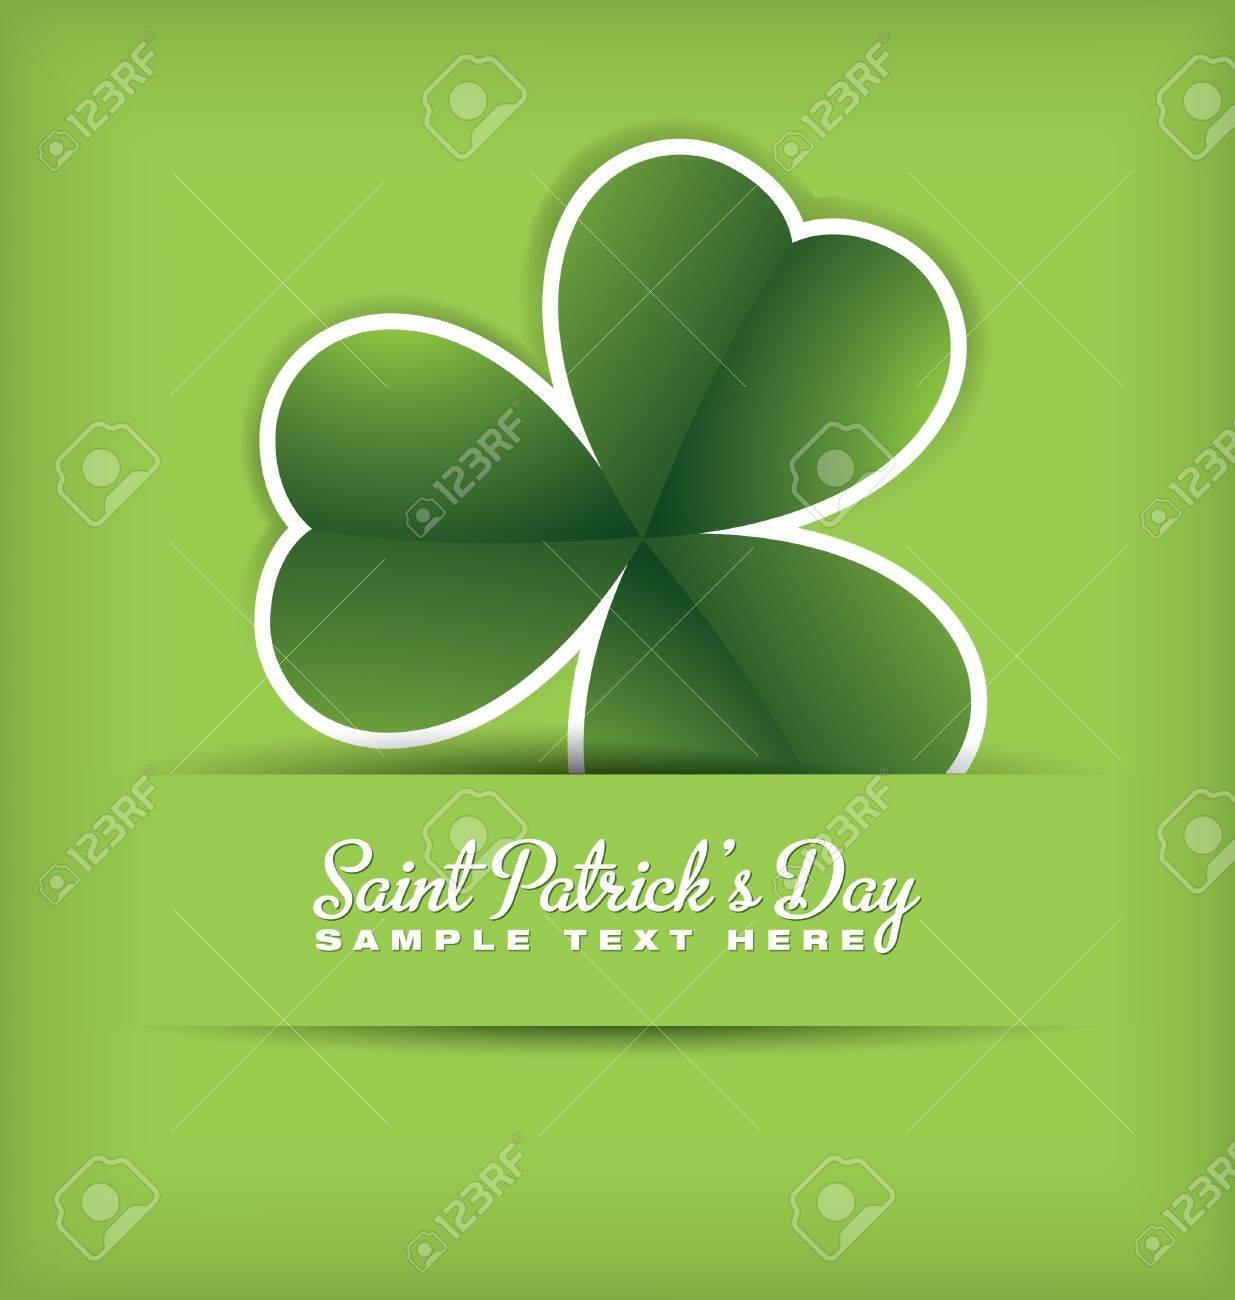 Saint Patrick s Day Design Stock Vector - 14576521